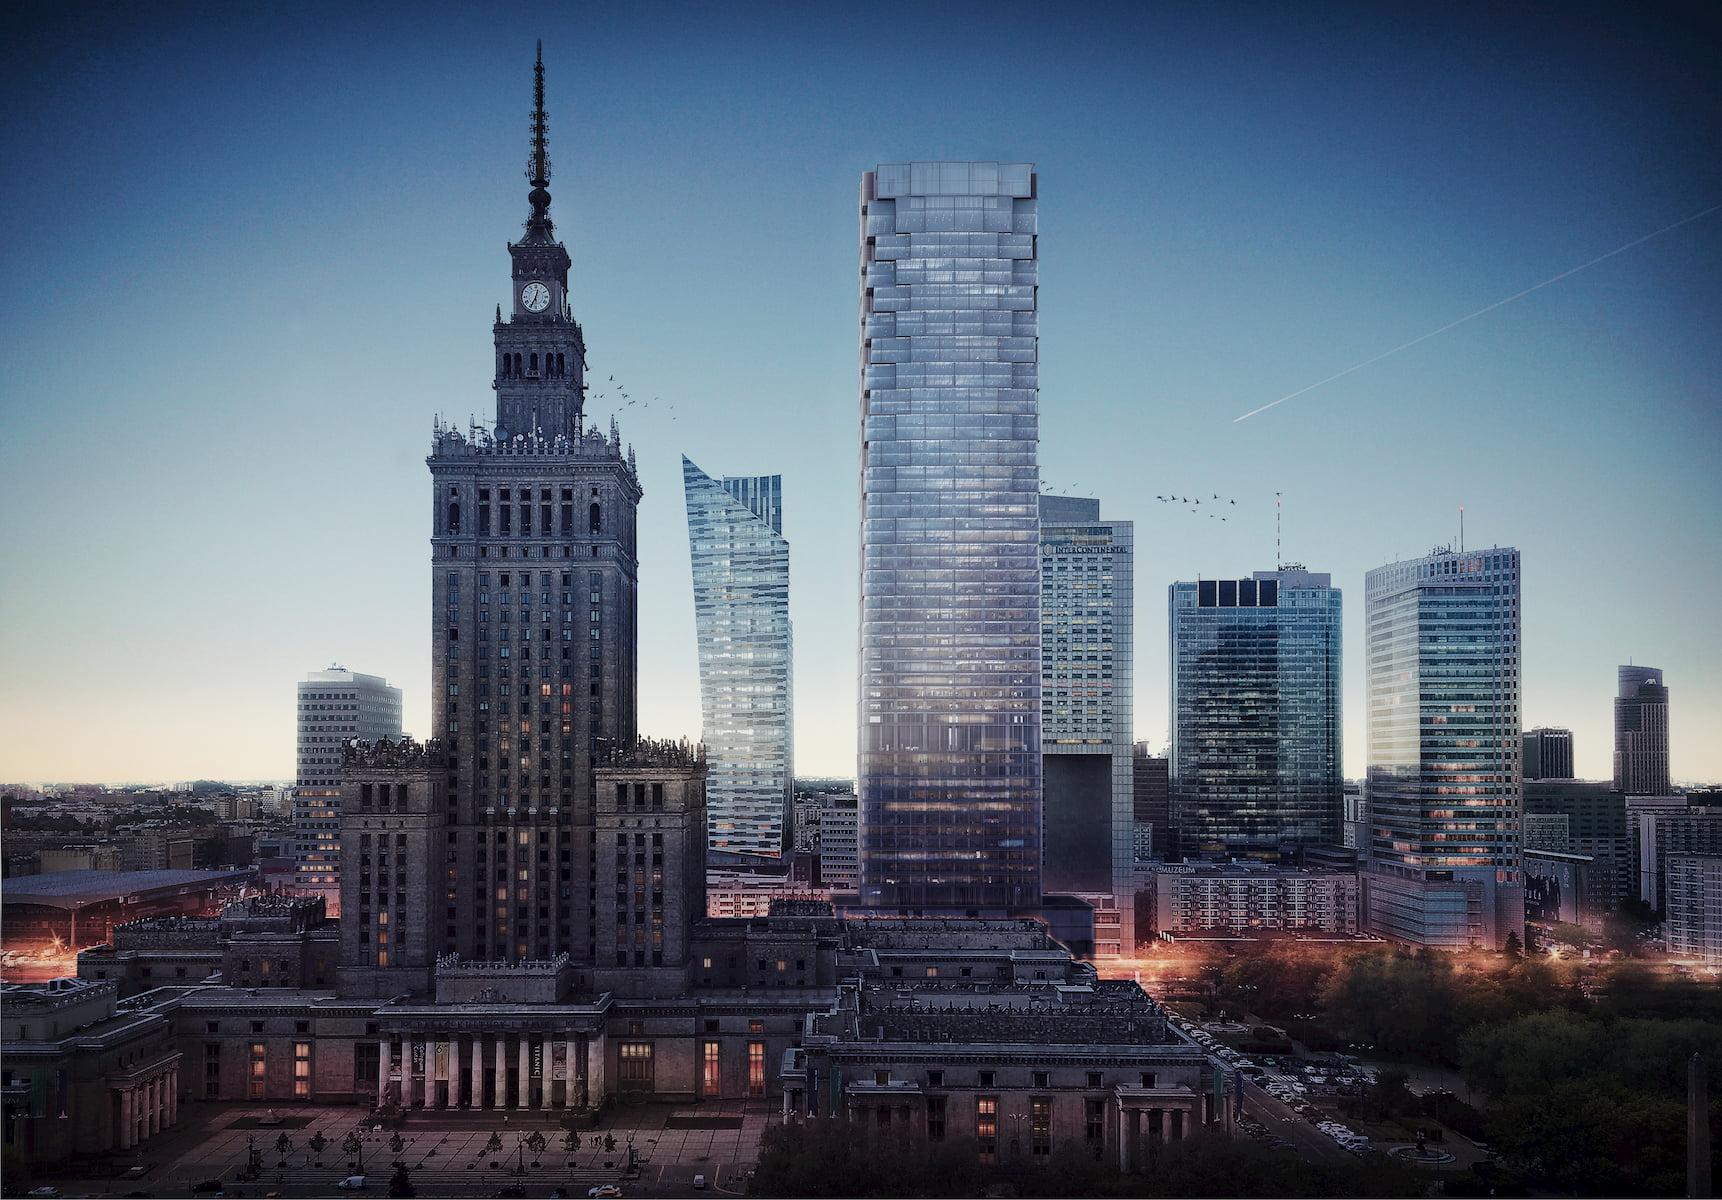 Office building Warsaw Kuryłowicz & Associates 2015 aerial view